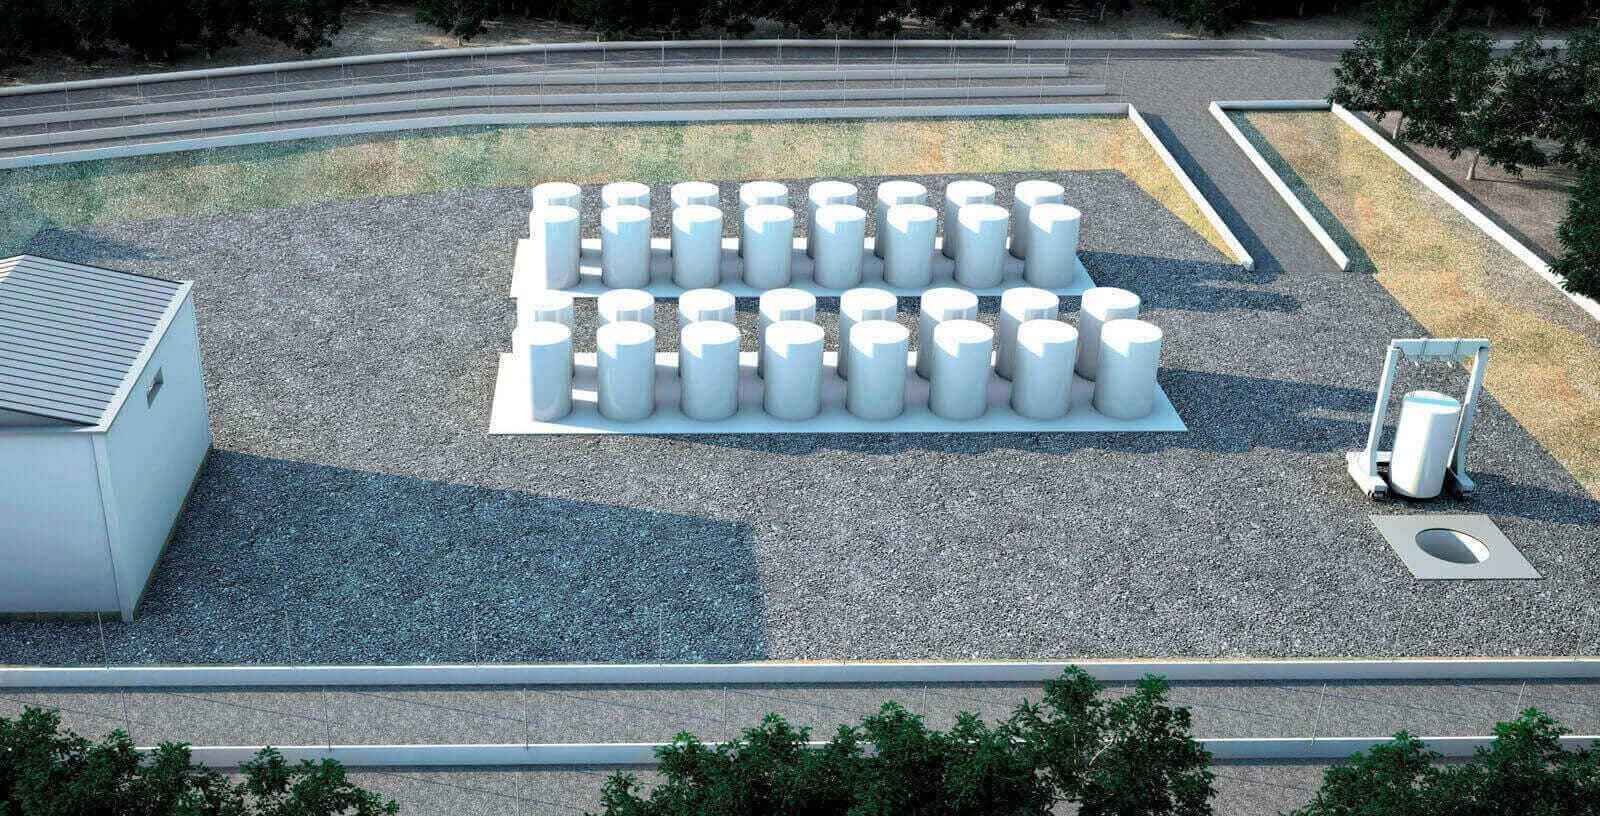 Idom_Nuclear_Services_NUCLENOR_Individual_Spent_Fuel_Storage_Installation_ISFSI_Santa_Mar_a_de_Garo_a_nuclear_power_plant_I_igo_Gutierrez